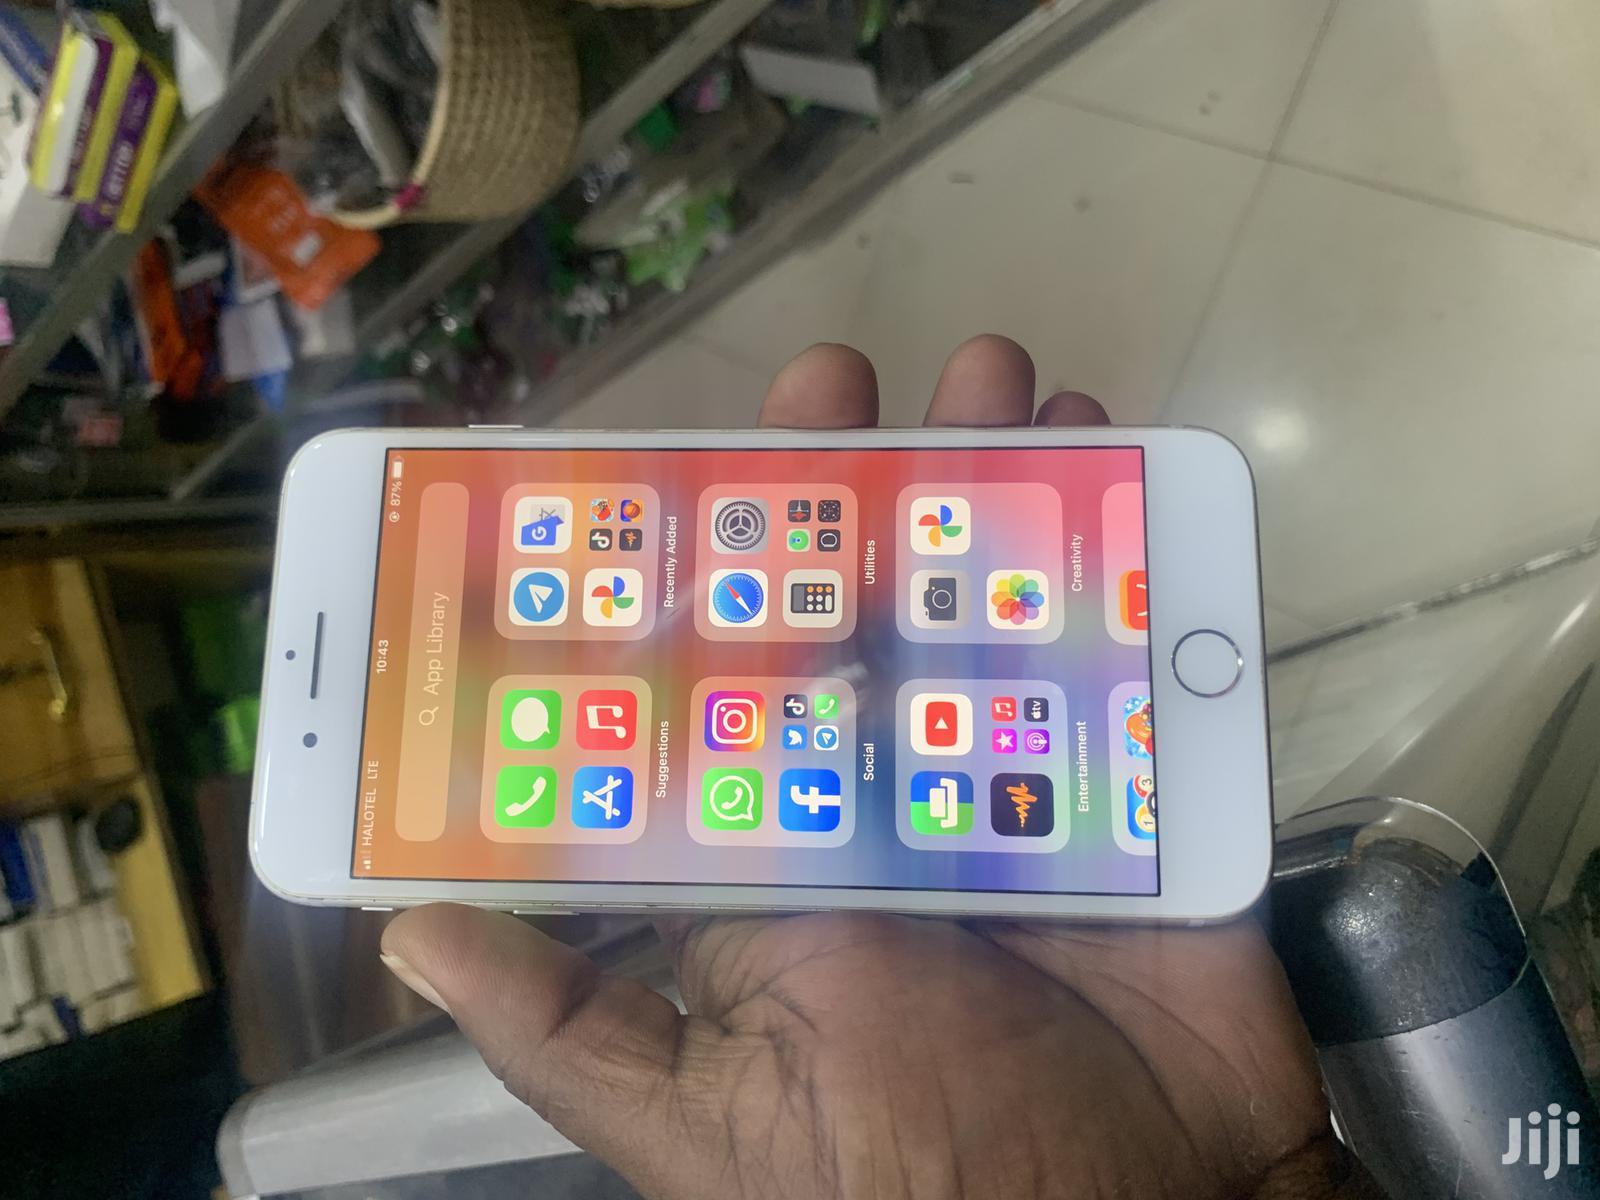 Apple iPhone 7 Plus 128 GB Silver | Mobile Phones for sale in Moshi Urban, Kilimanjaro Region, Tanzania